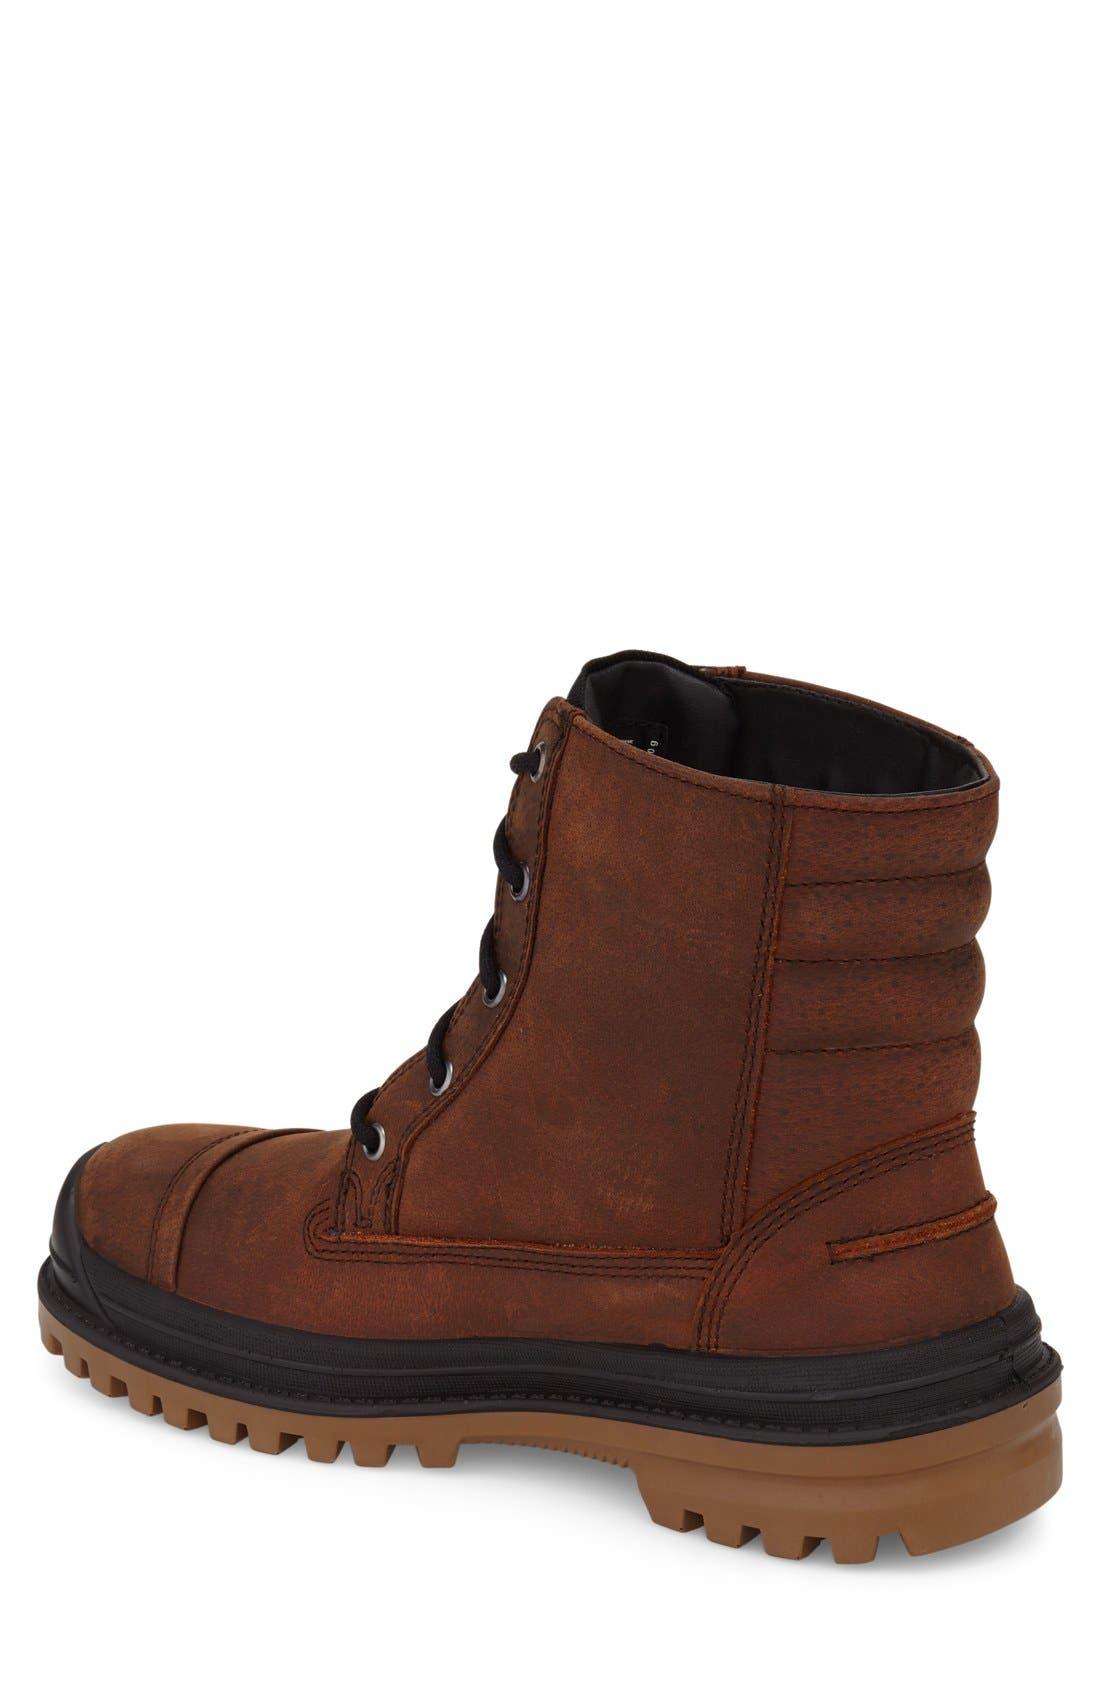 Griffon Waterproof Boot,                             Alternate thumbnail 6, color,